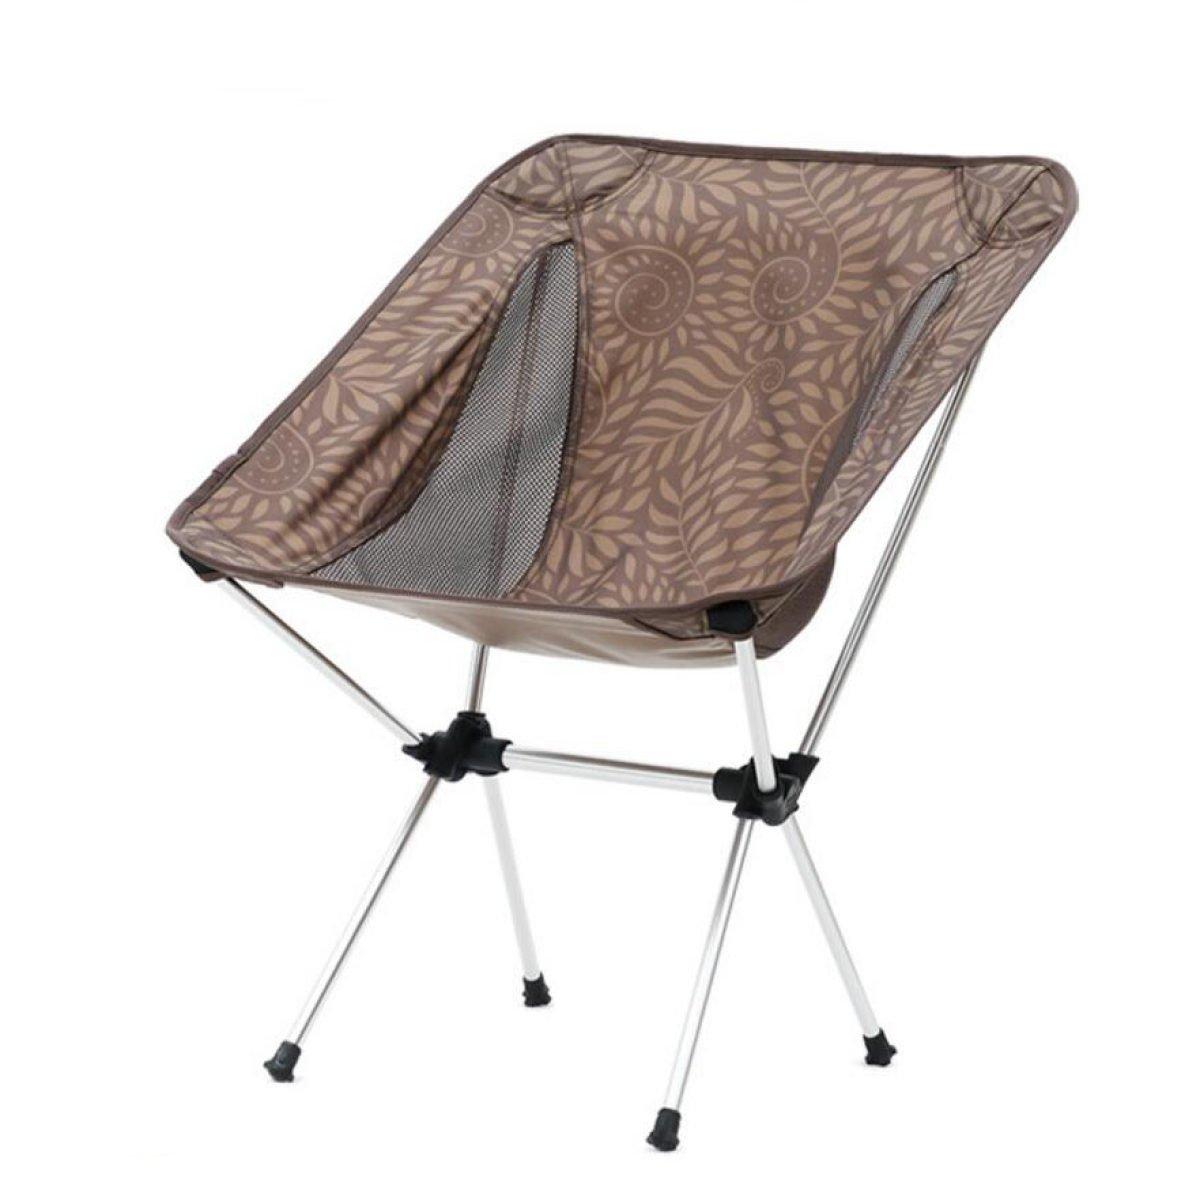 CHENGXIAOXUAN Talon Leicht Aluminium Im Freien Falte Portable Liegestühle Camping Grill Stuhl 800 G 250 Pfund Last,Braun